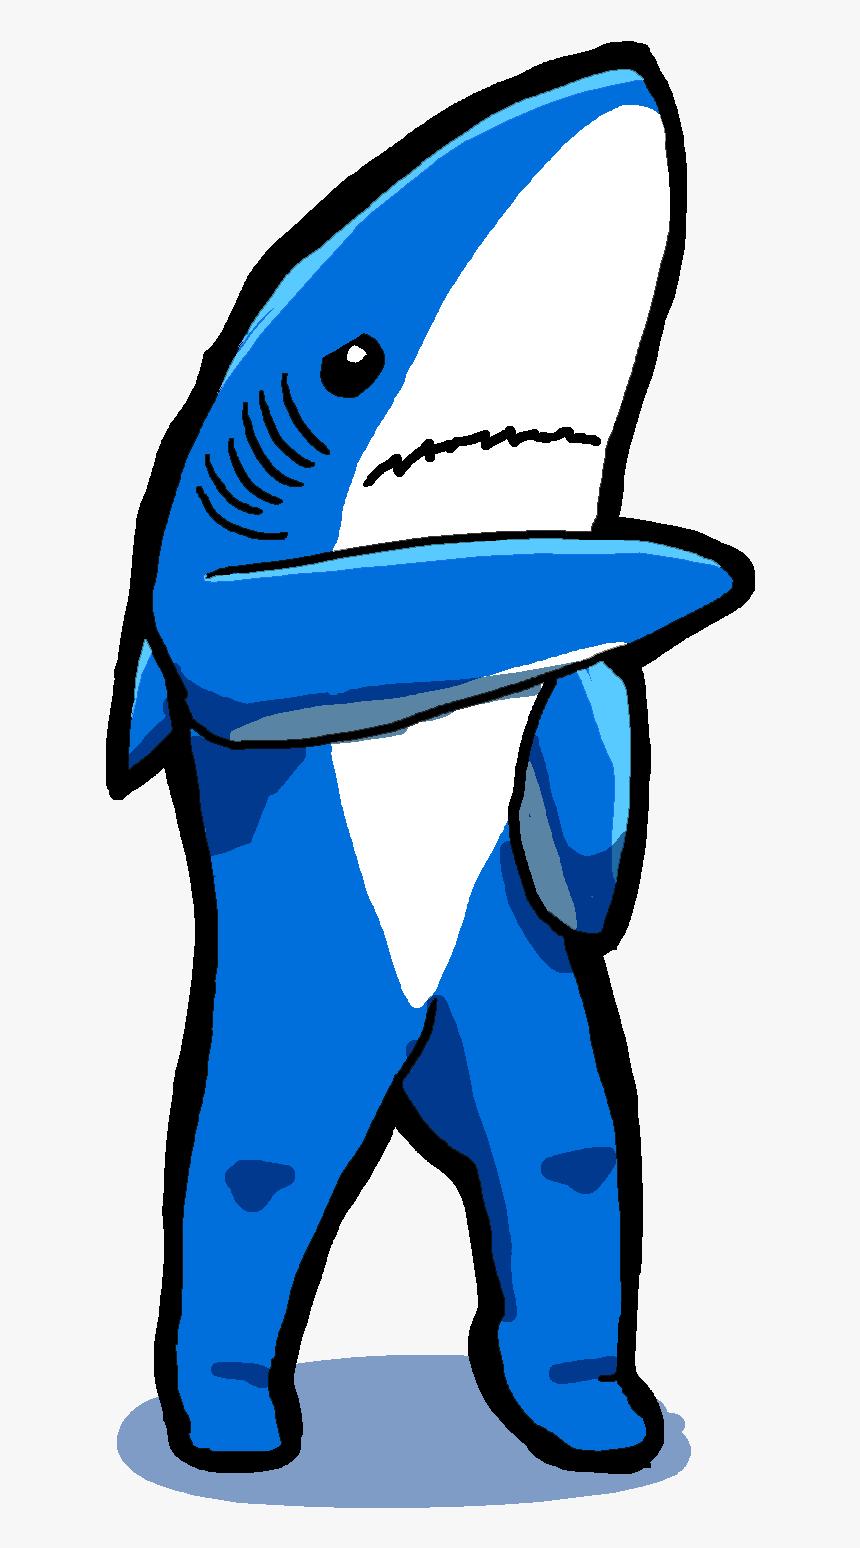 Dancing Shark Gif Transparent, HD Png Download, Free Download